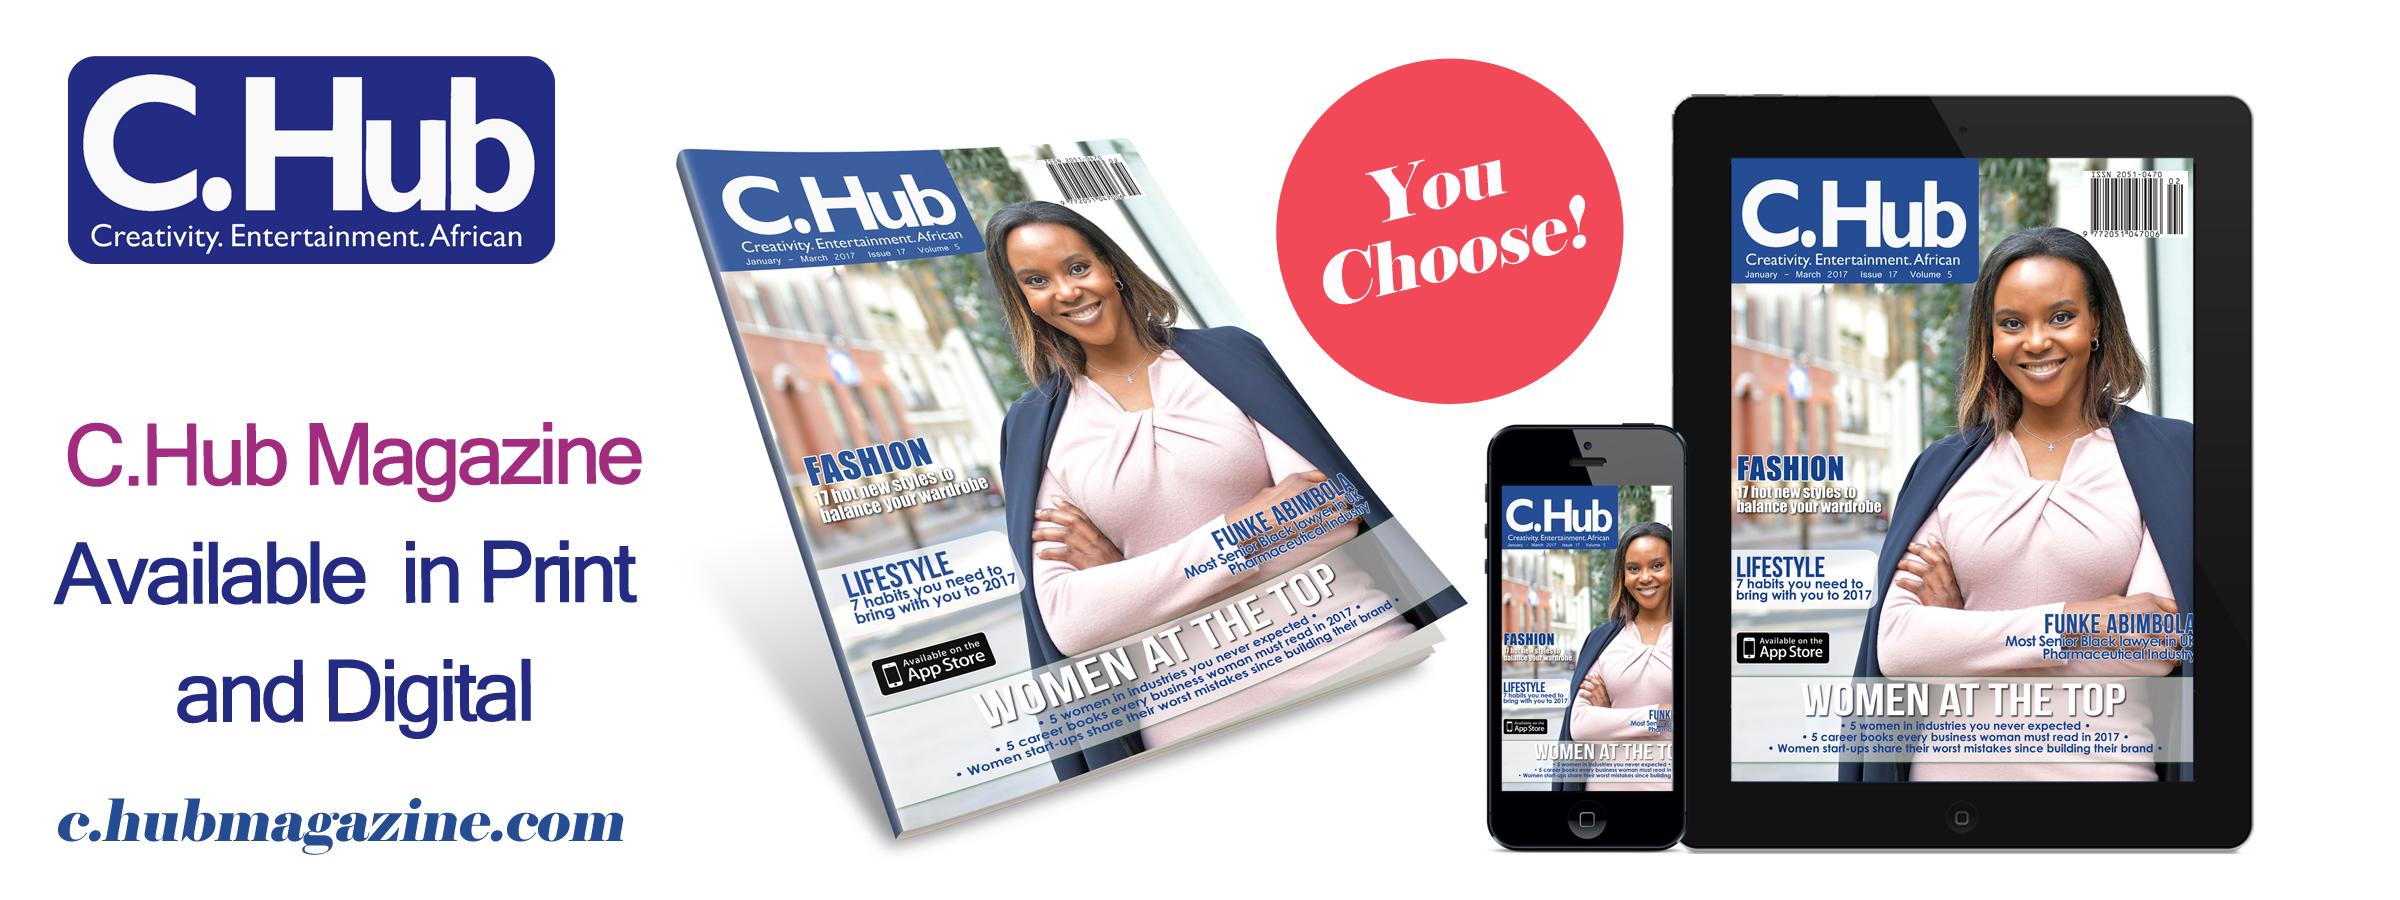 C. Hub Magazine on the App Store.